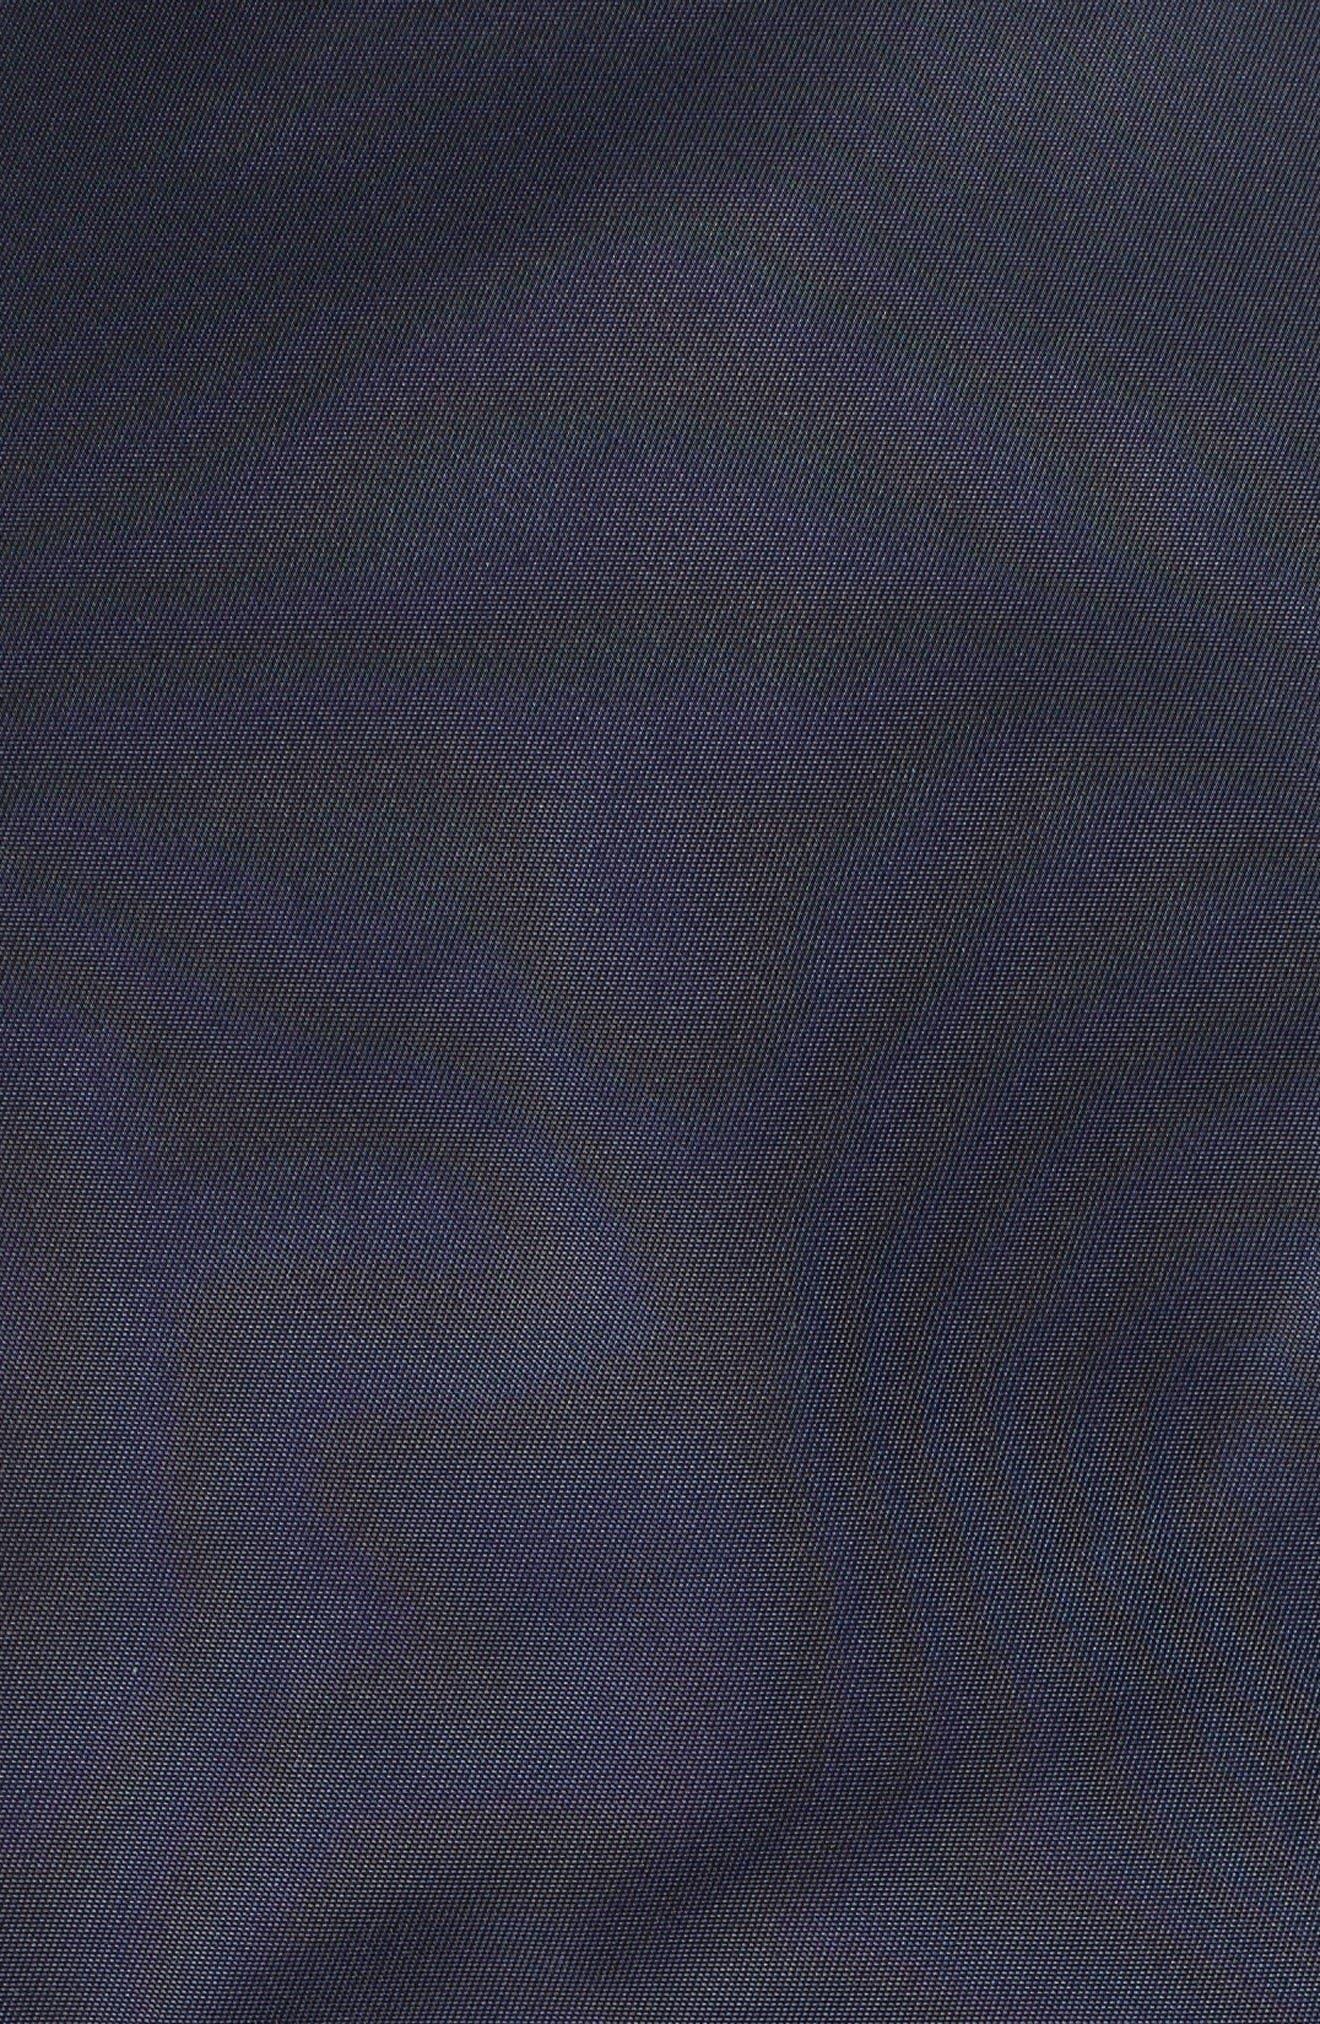 Ruffle Bomber Jacket,                             Alternate thumbnail 6, color,                             Navy